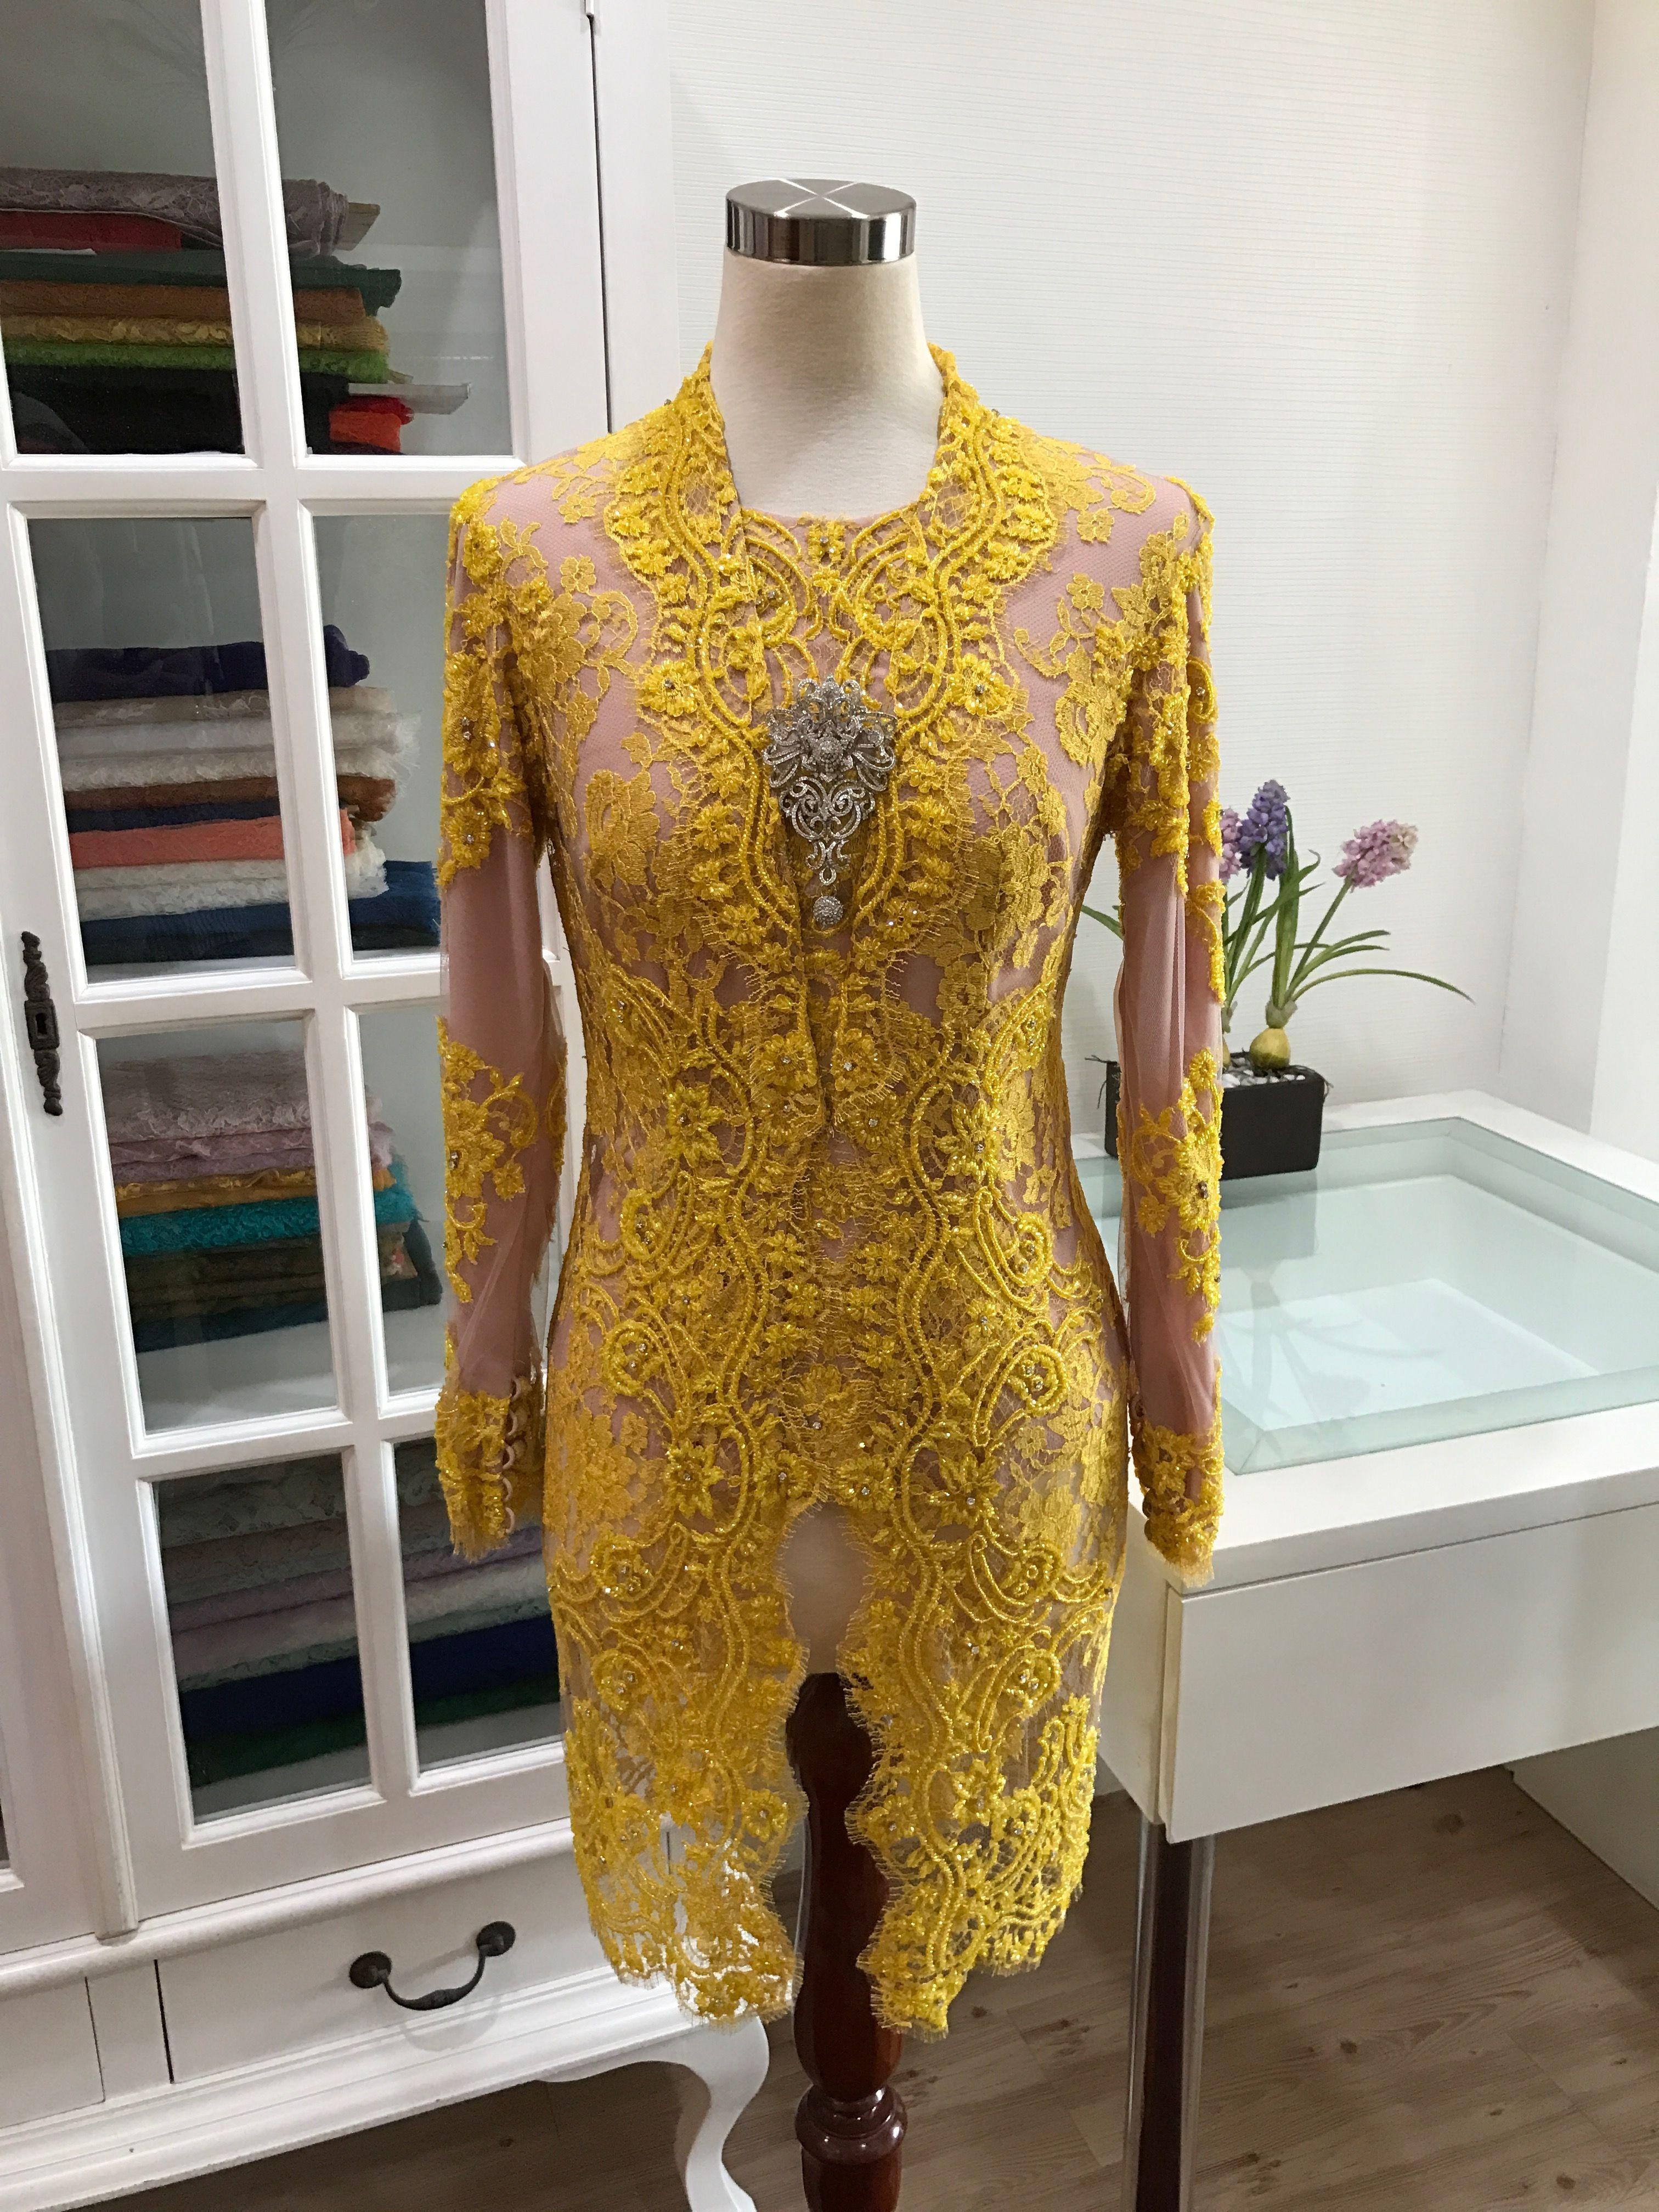 Muzułmańska Kebaya Kebaya Brokat Moda Muzułmańska Indonezja Tajlandia Bluza Å ³Å'ty